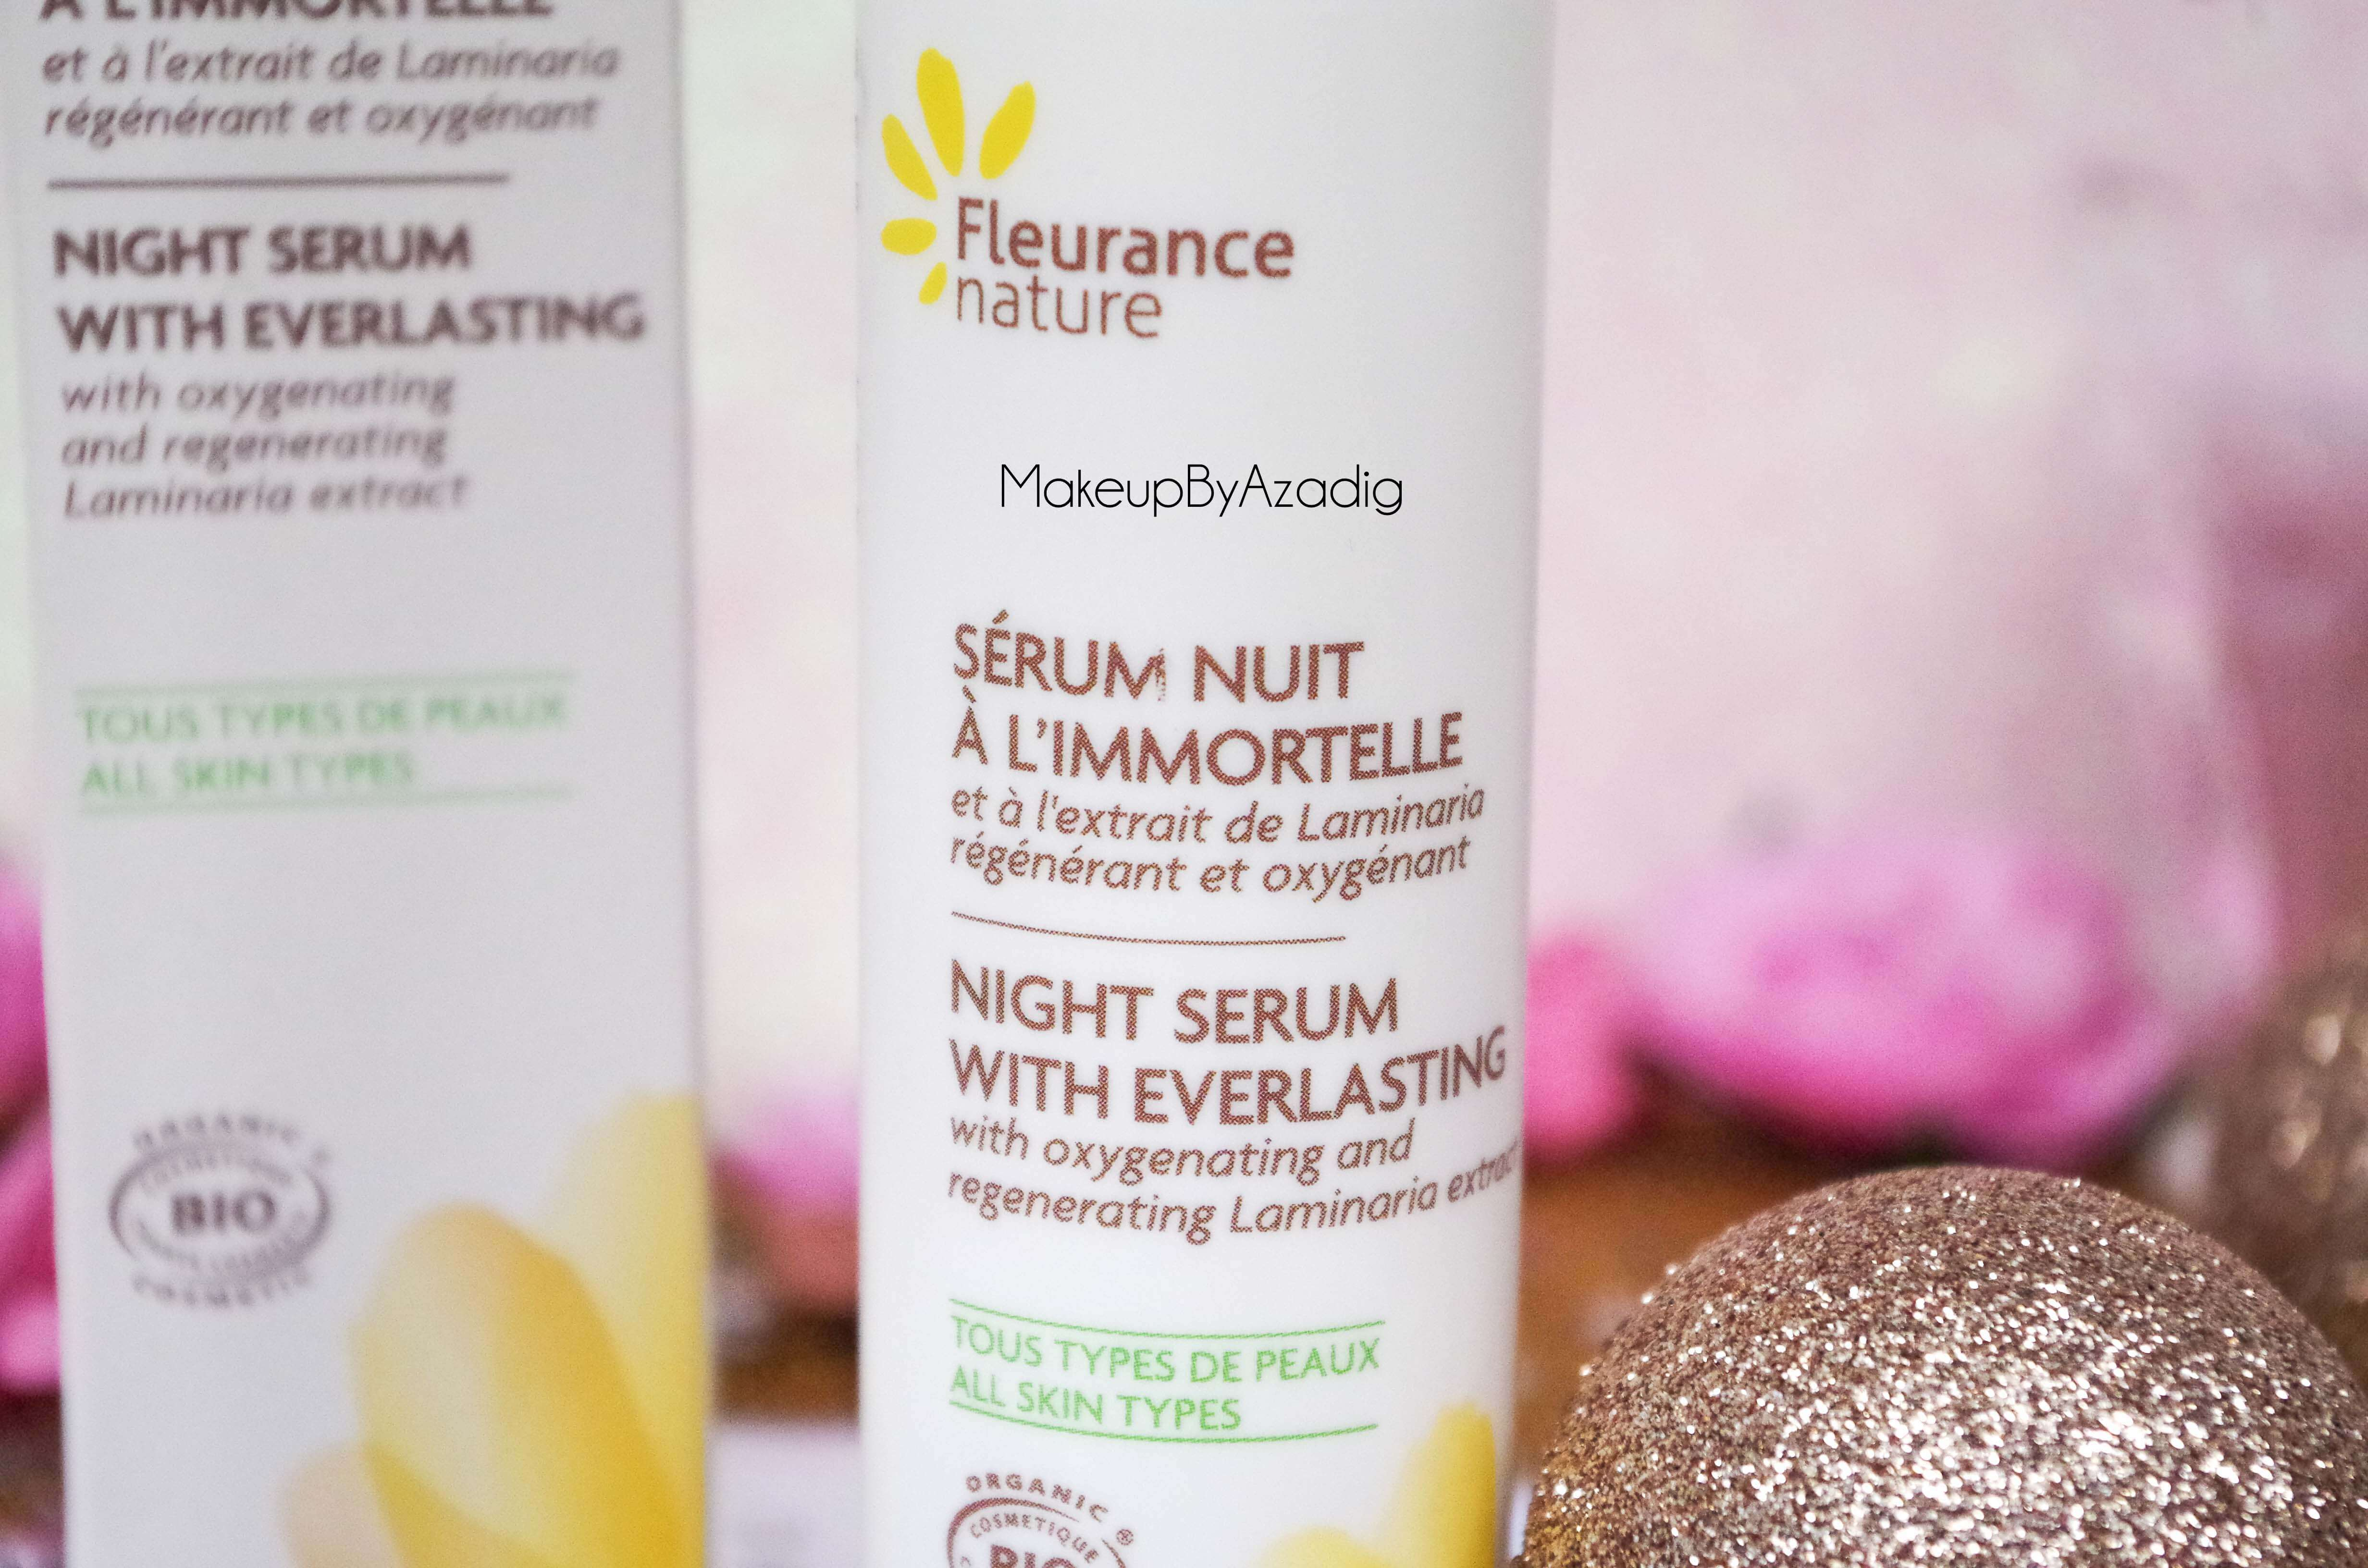 creme-nutrition-intense-serum-nuit-fleur-immortelle-fleurance-nature-makeupbyazadig-revue-prix-avis-laminaria